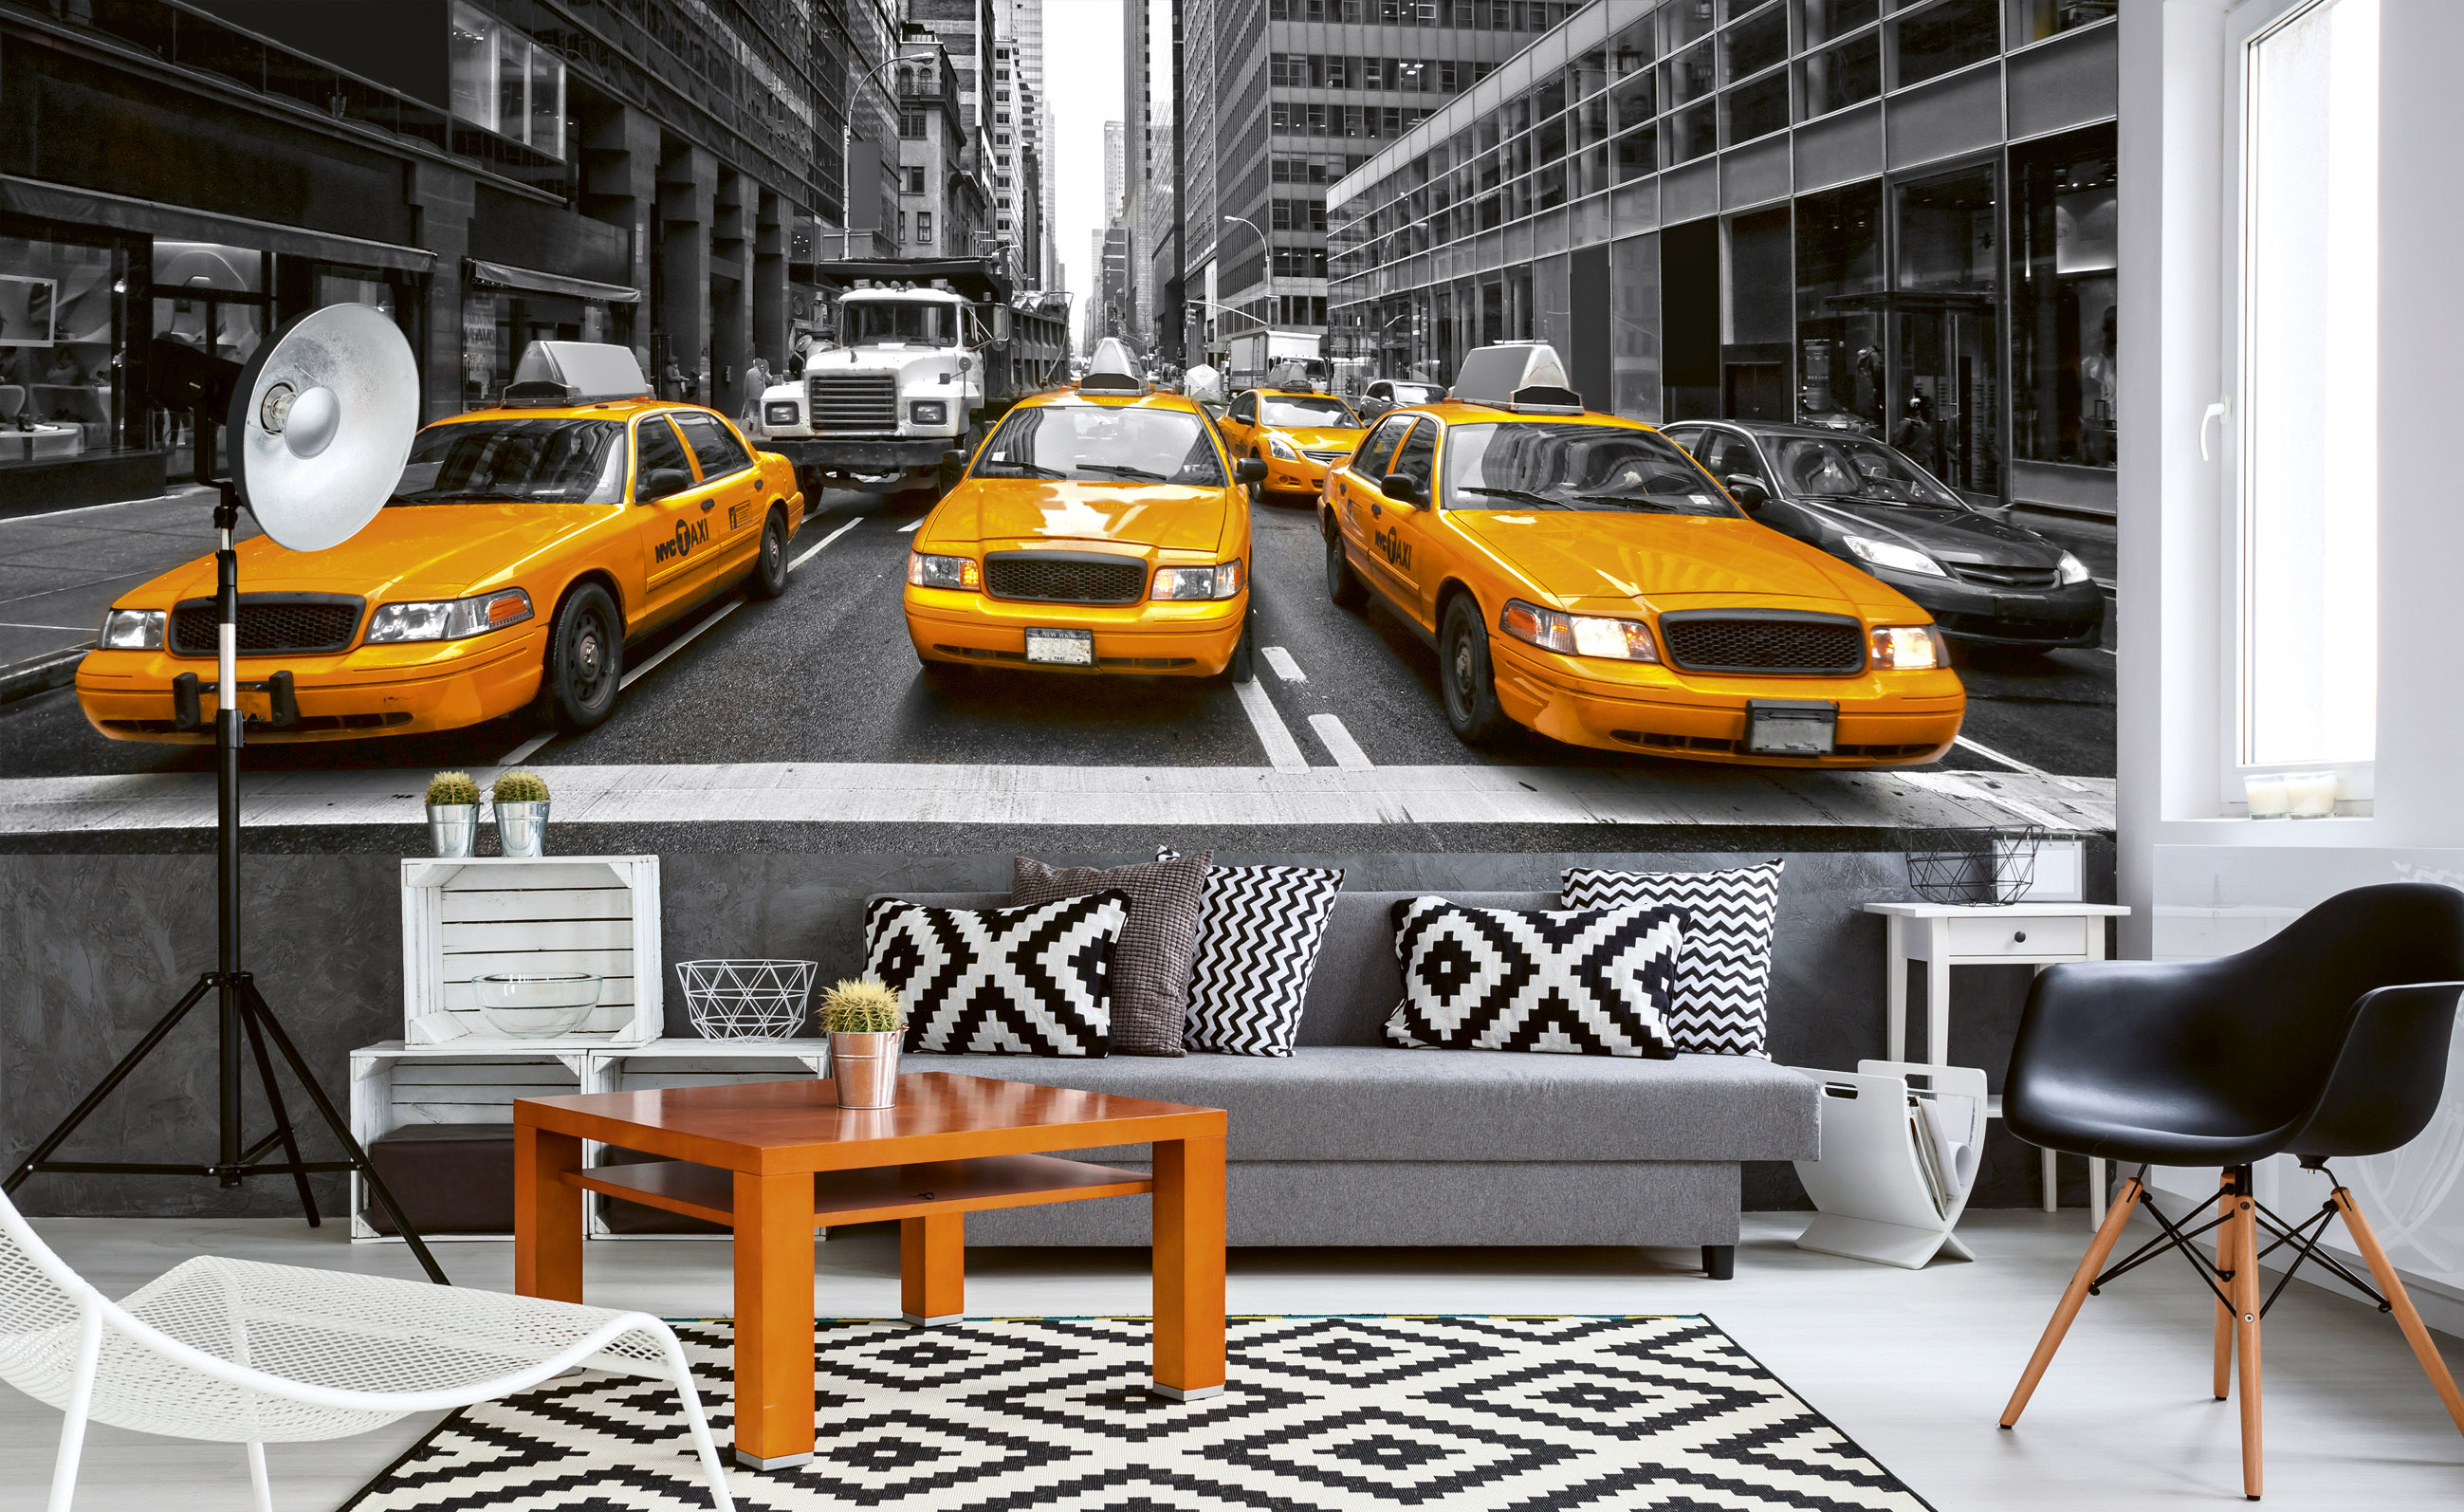 Fototapet Yellow Cabs – panorama